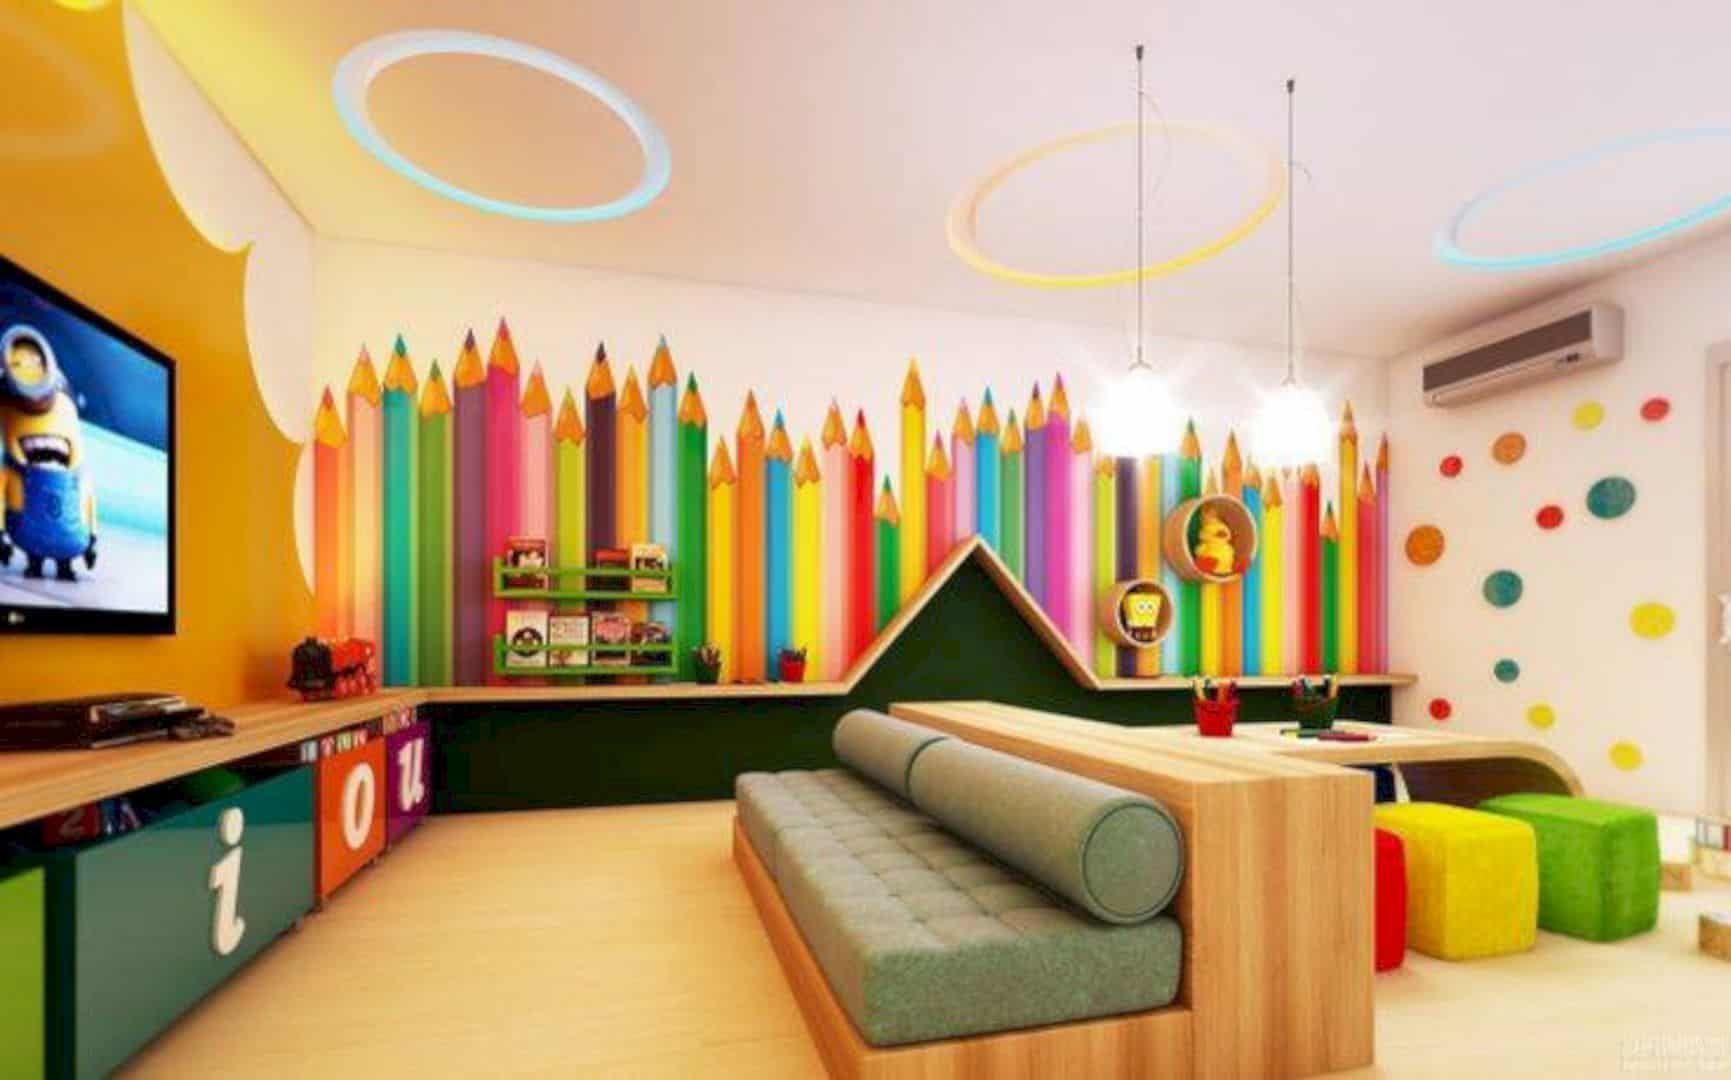 Home Daycare Design Ideas: 16 Office Interior Design Ideas